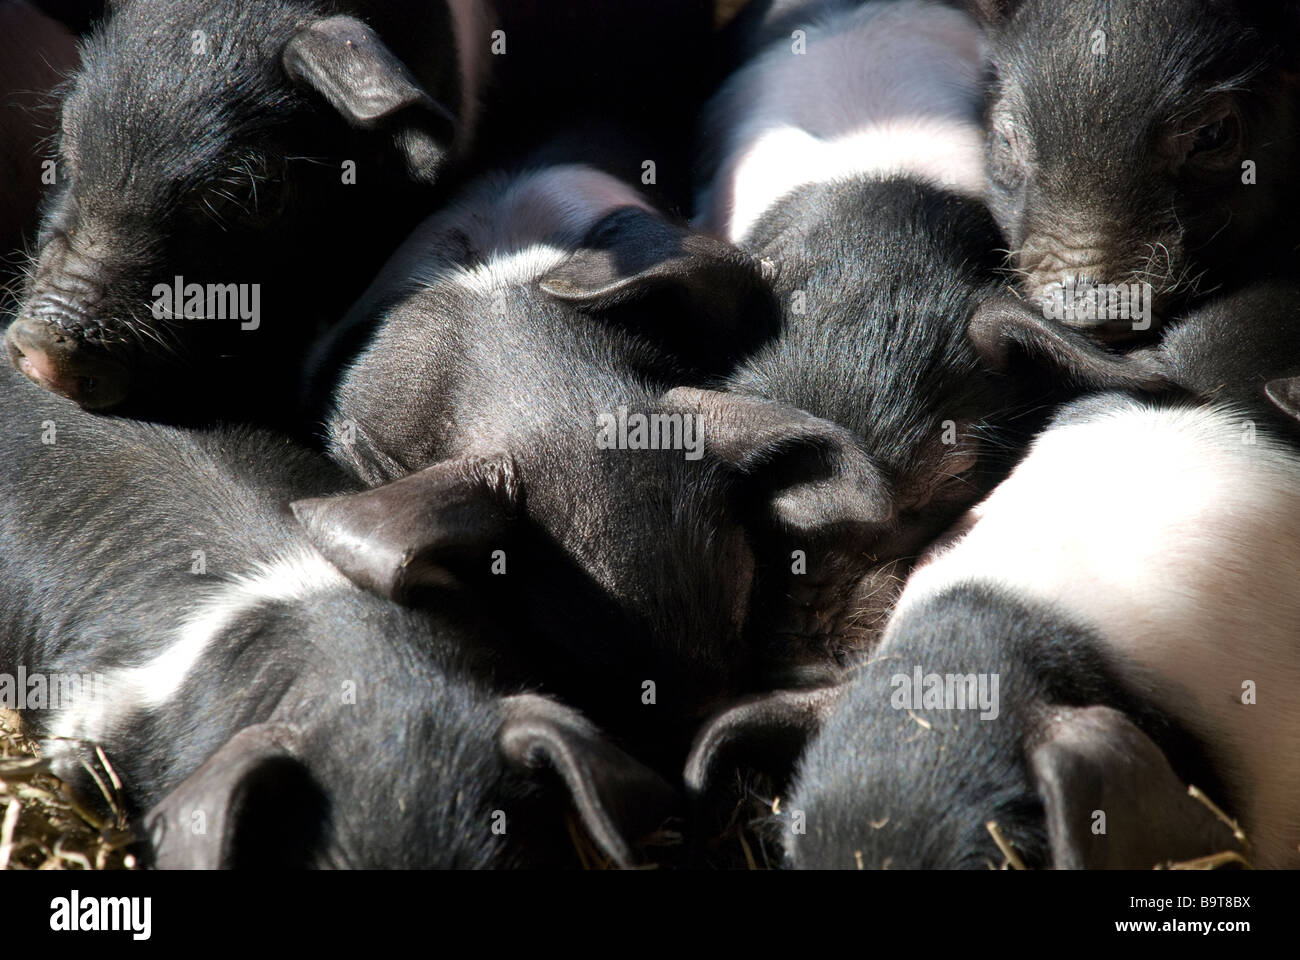 Piglet Piglets Pig Pork Bacon Baby Little Cute Fur Pink Black Sun Sleep Family Brother Sister Play Eat Farm Snuggle Oink Swine